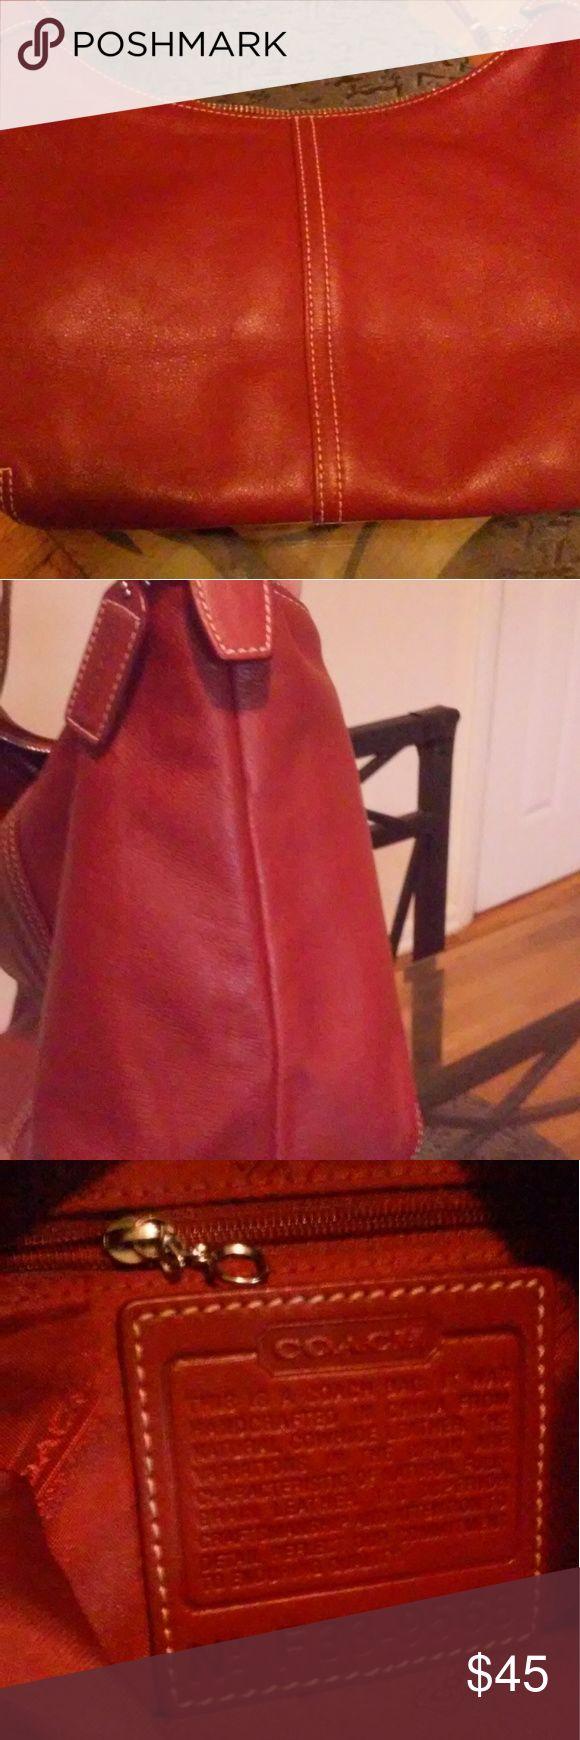 Authentic Coach purse Beautiful burgandy cherry red Coach purse. Excellent condition. clean no wear no damages. Coach Bags Shoulder Bags